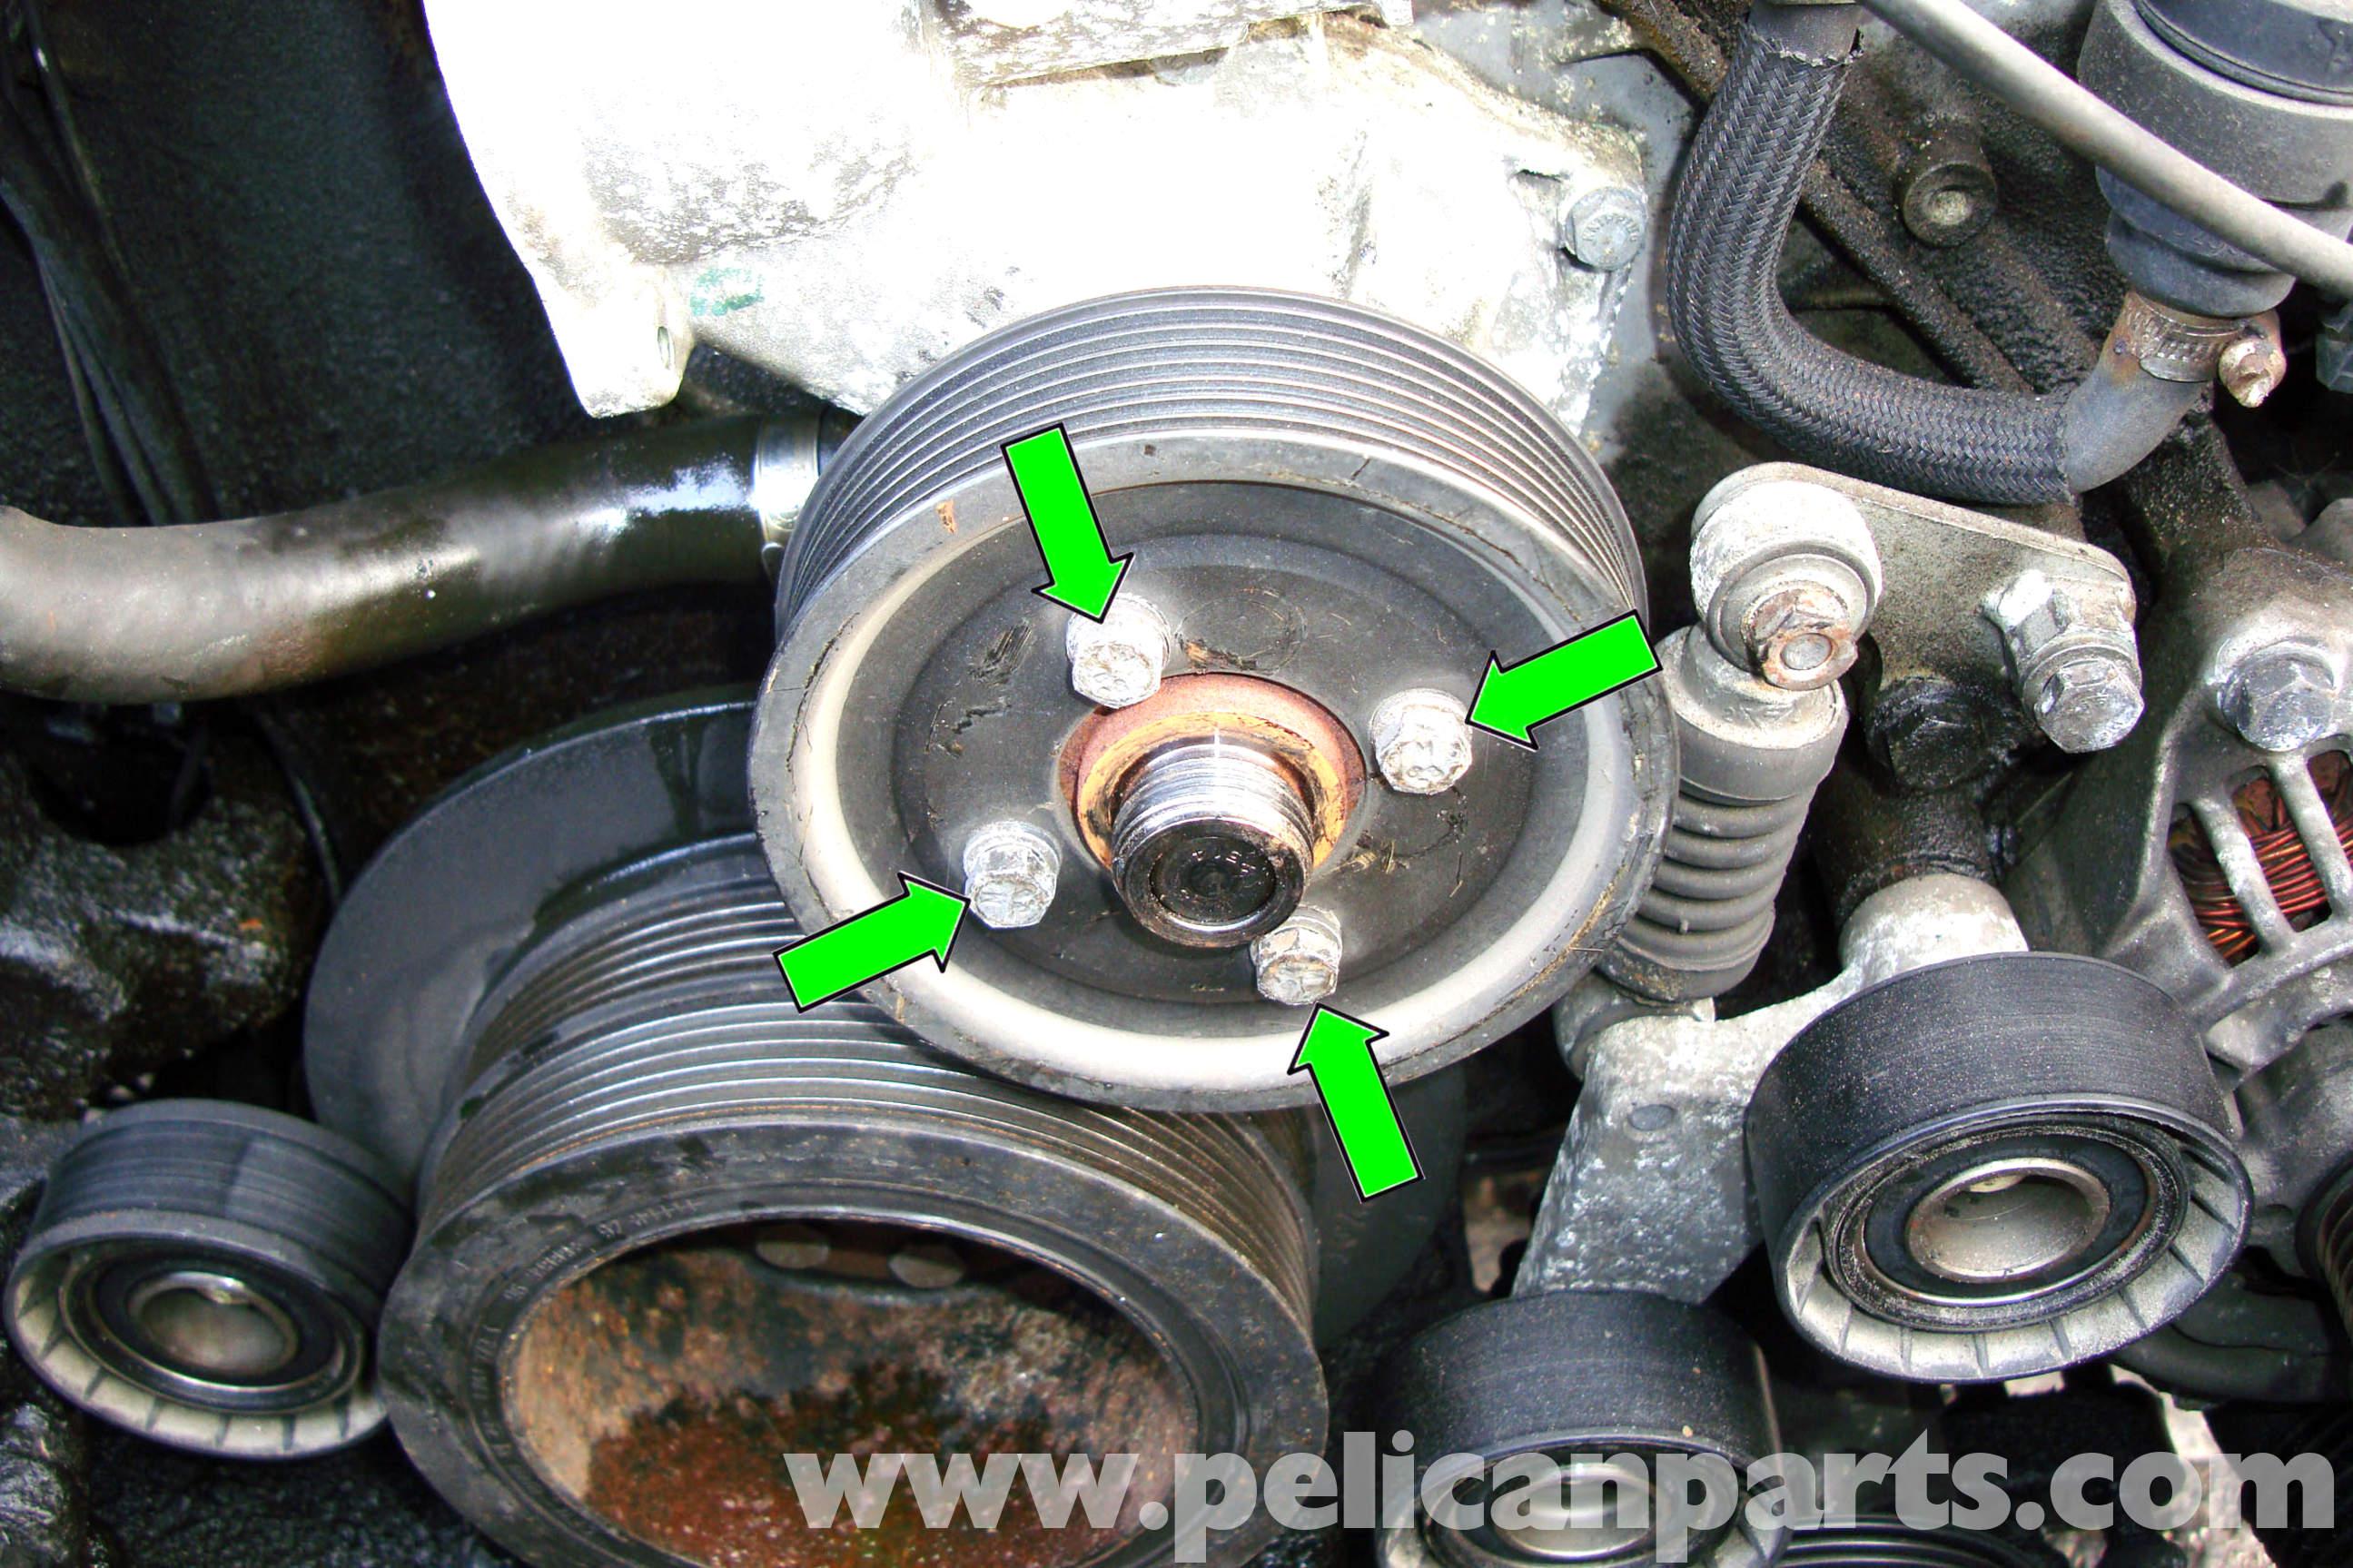 Bmw 540i Belt Diagram Trusted Wiring 1997 528i Engine Water Pump Smart Diagrams U2022 2008